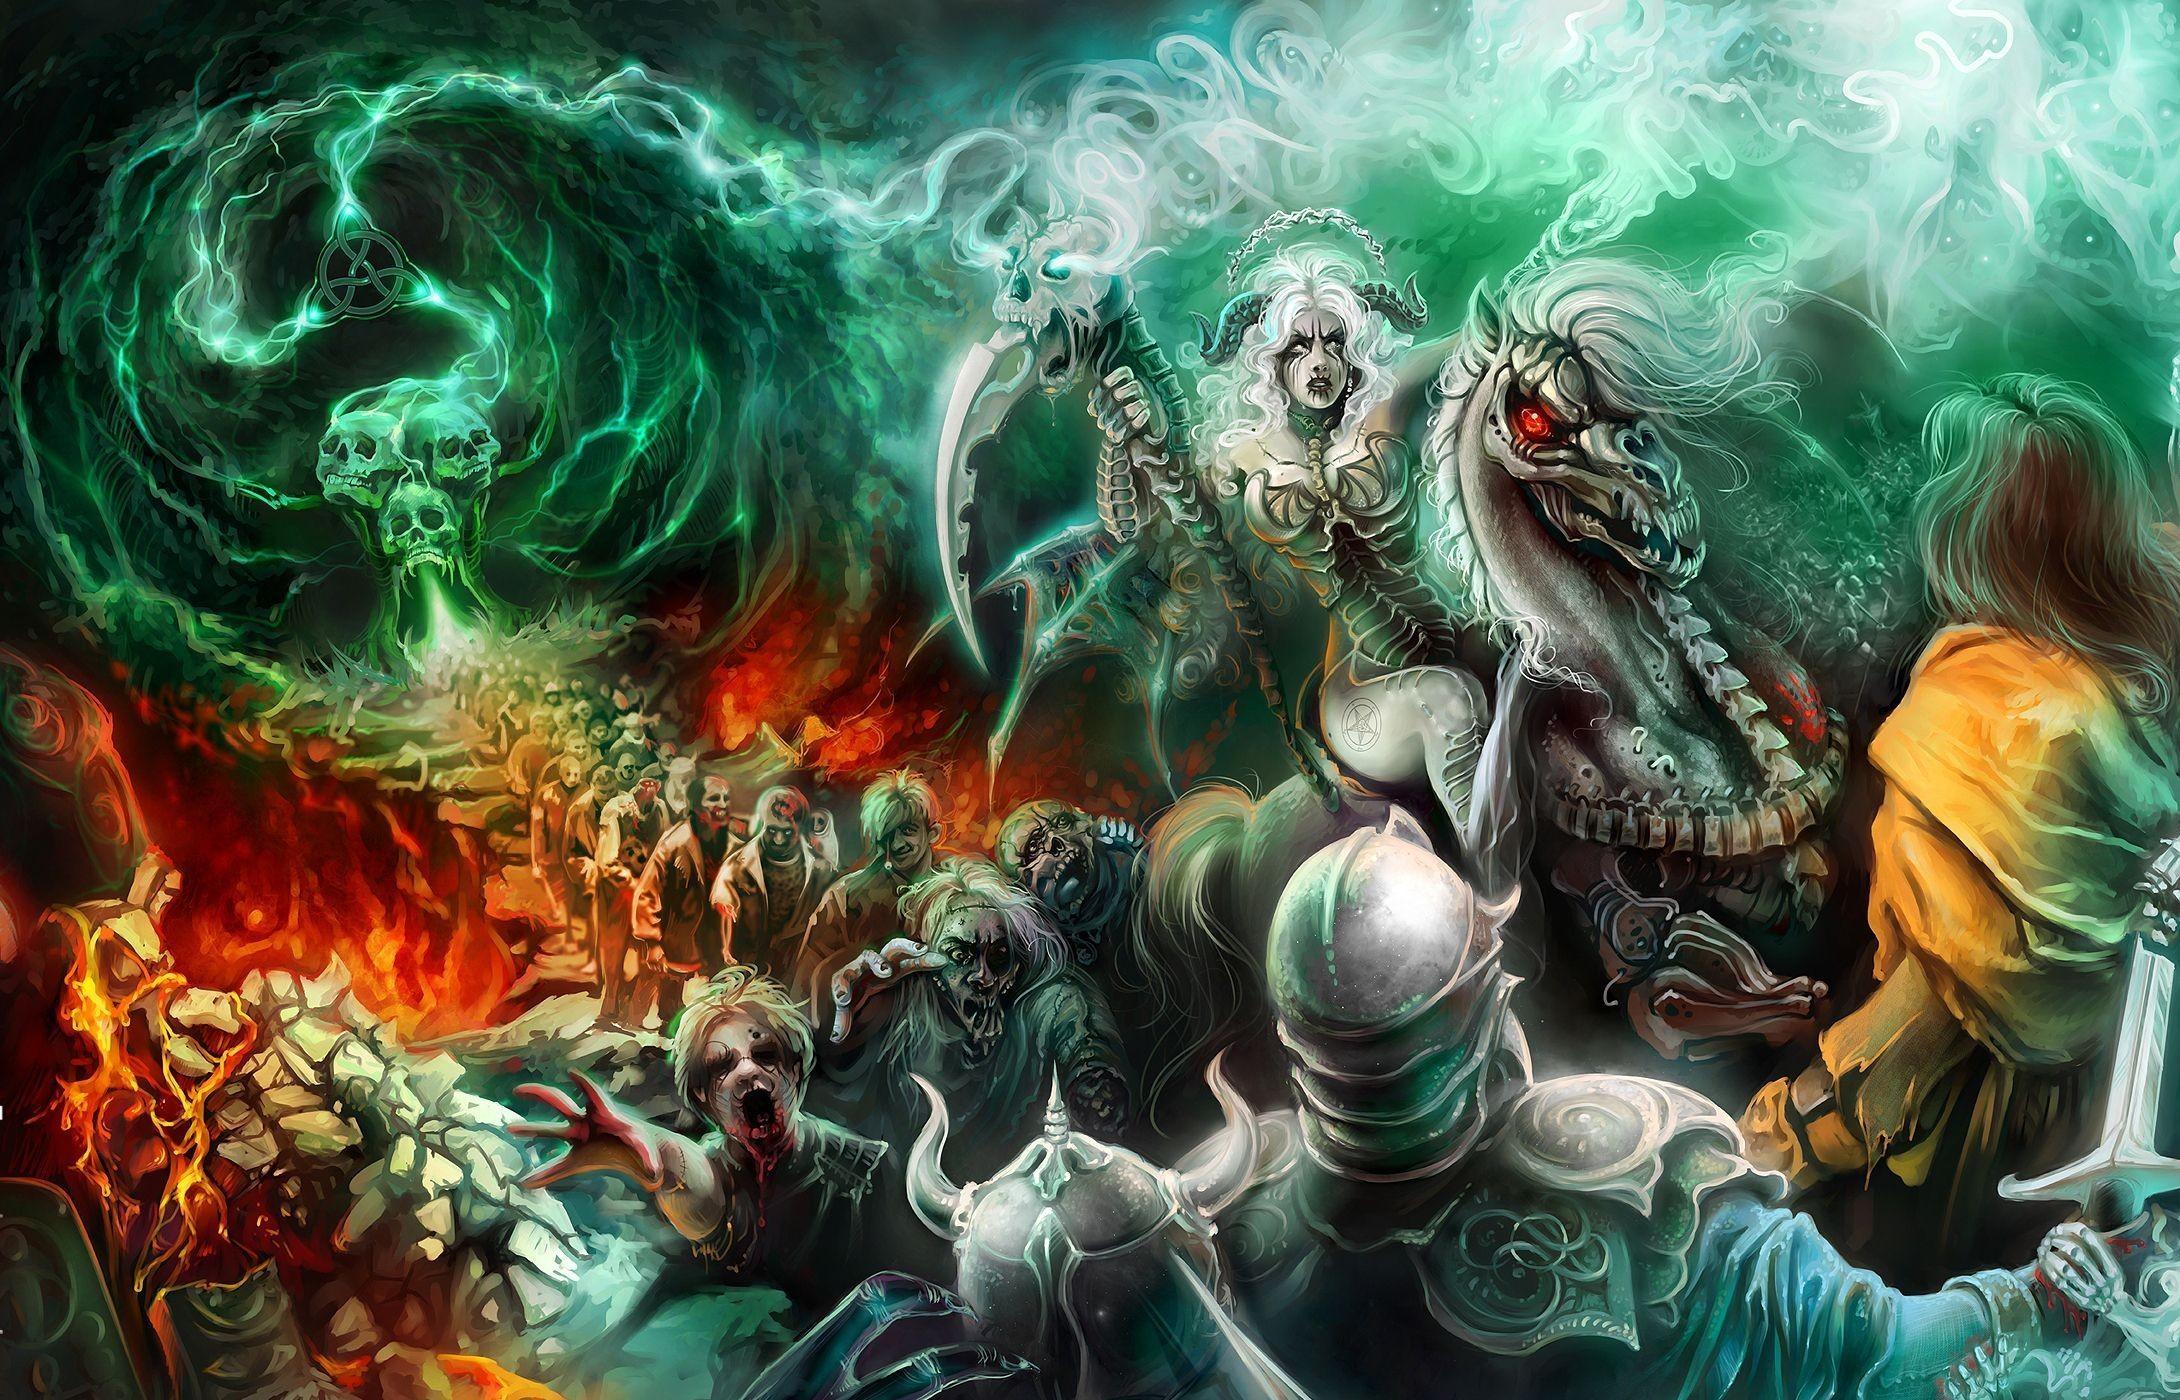 Fantasy Art Necromancers Wallpapers Hd Desktop And: Wallpaper : Black Magic, Undead, Skull, Dead, Army